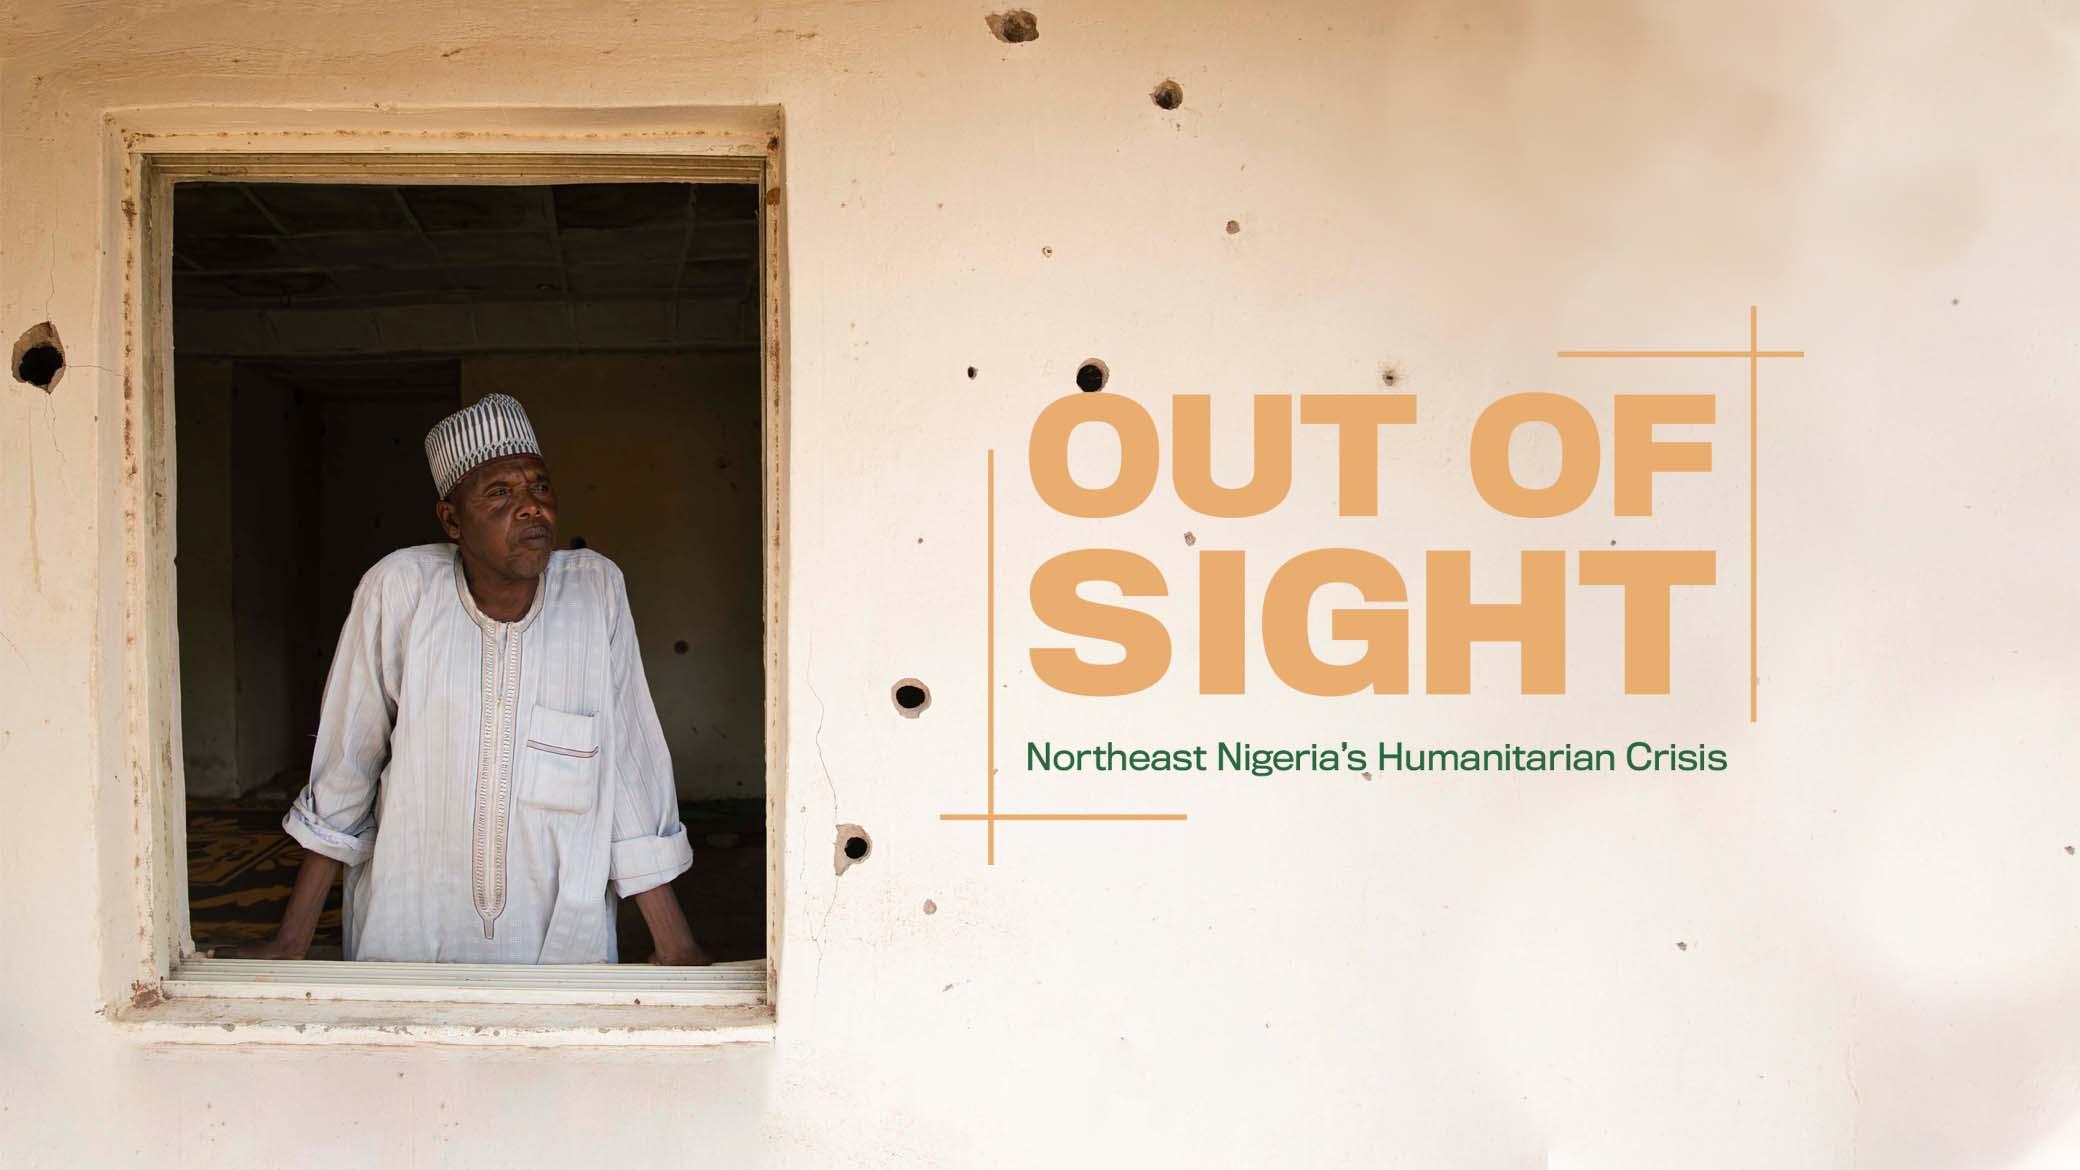 https://www.csis.org/analysis/out-sight-northeast-nigerias-humanitarian-crisis